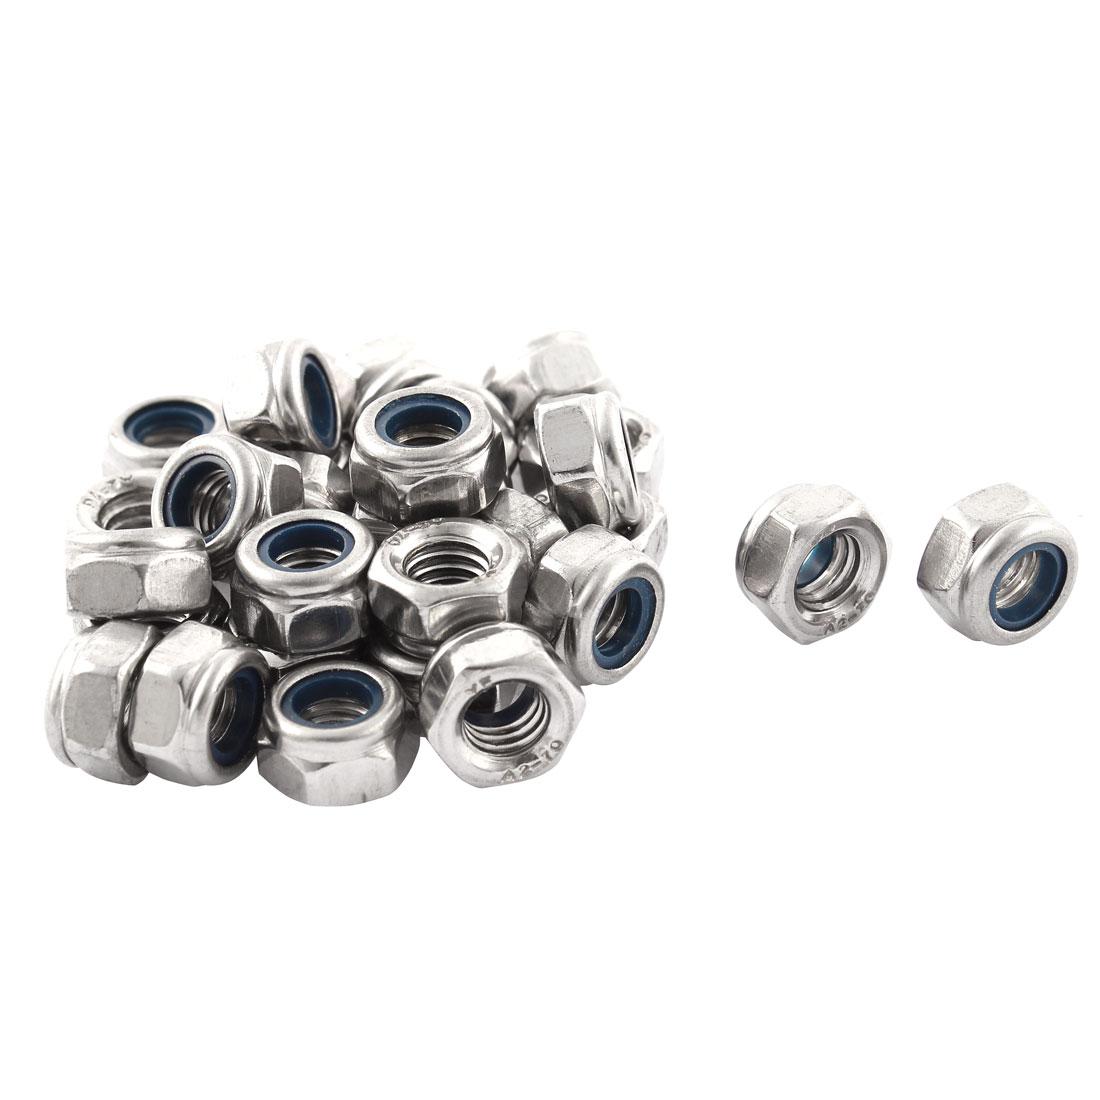 30 Pcs M6x1mm Metric Stainless Steel Anti-loose Nylon Insert Lock Hex Nuts